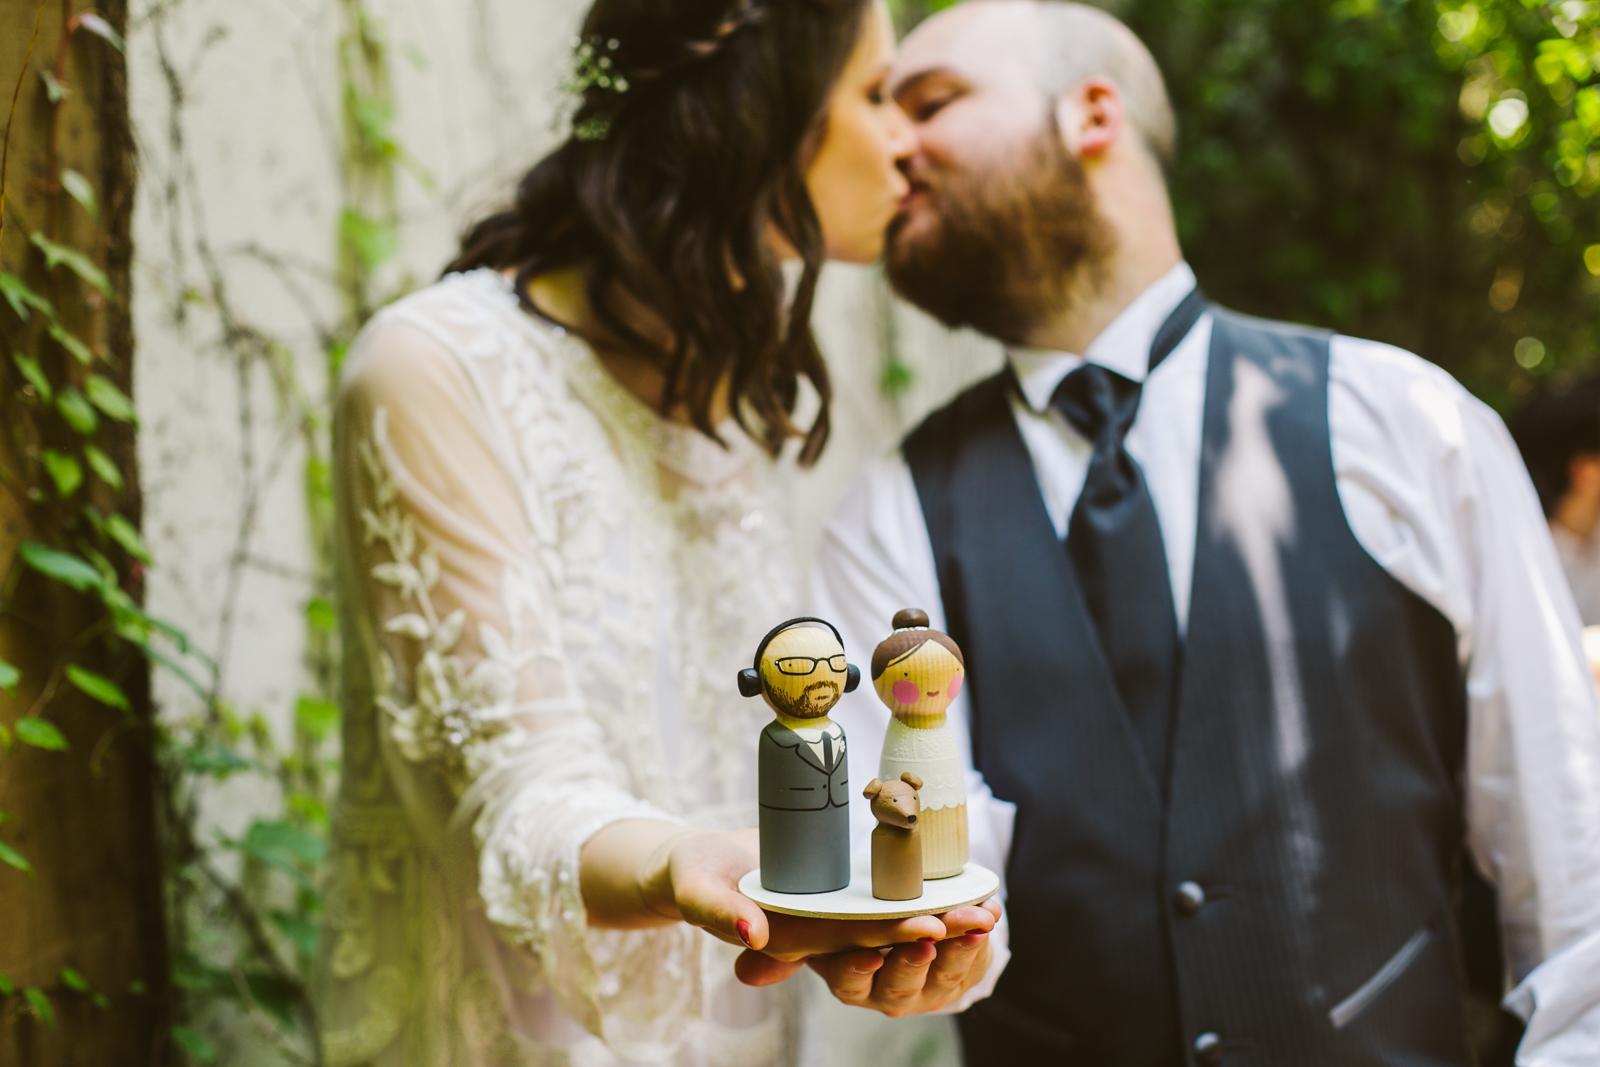 Casamento simples mostra que o amor é o que conta 10